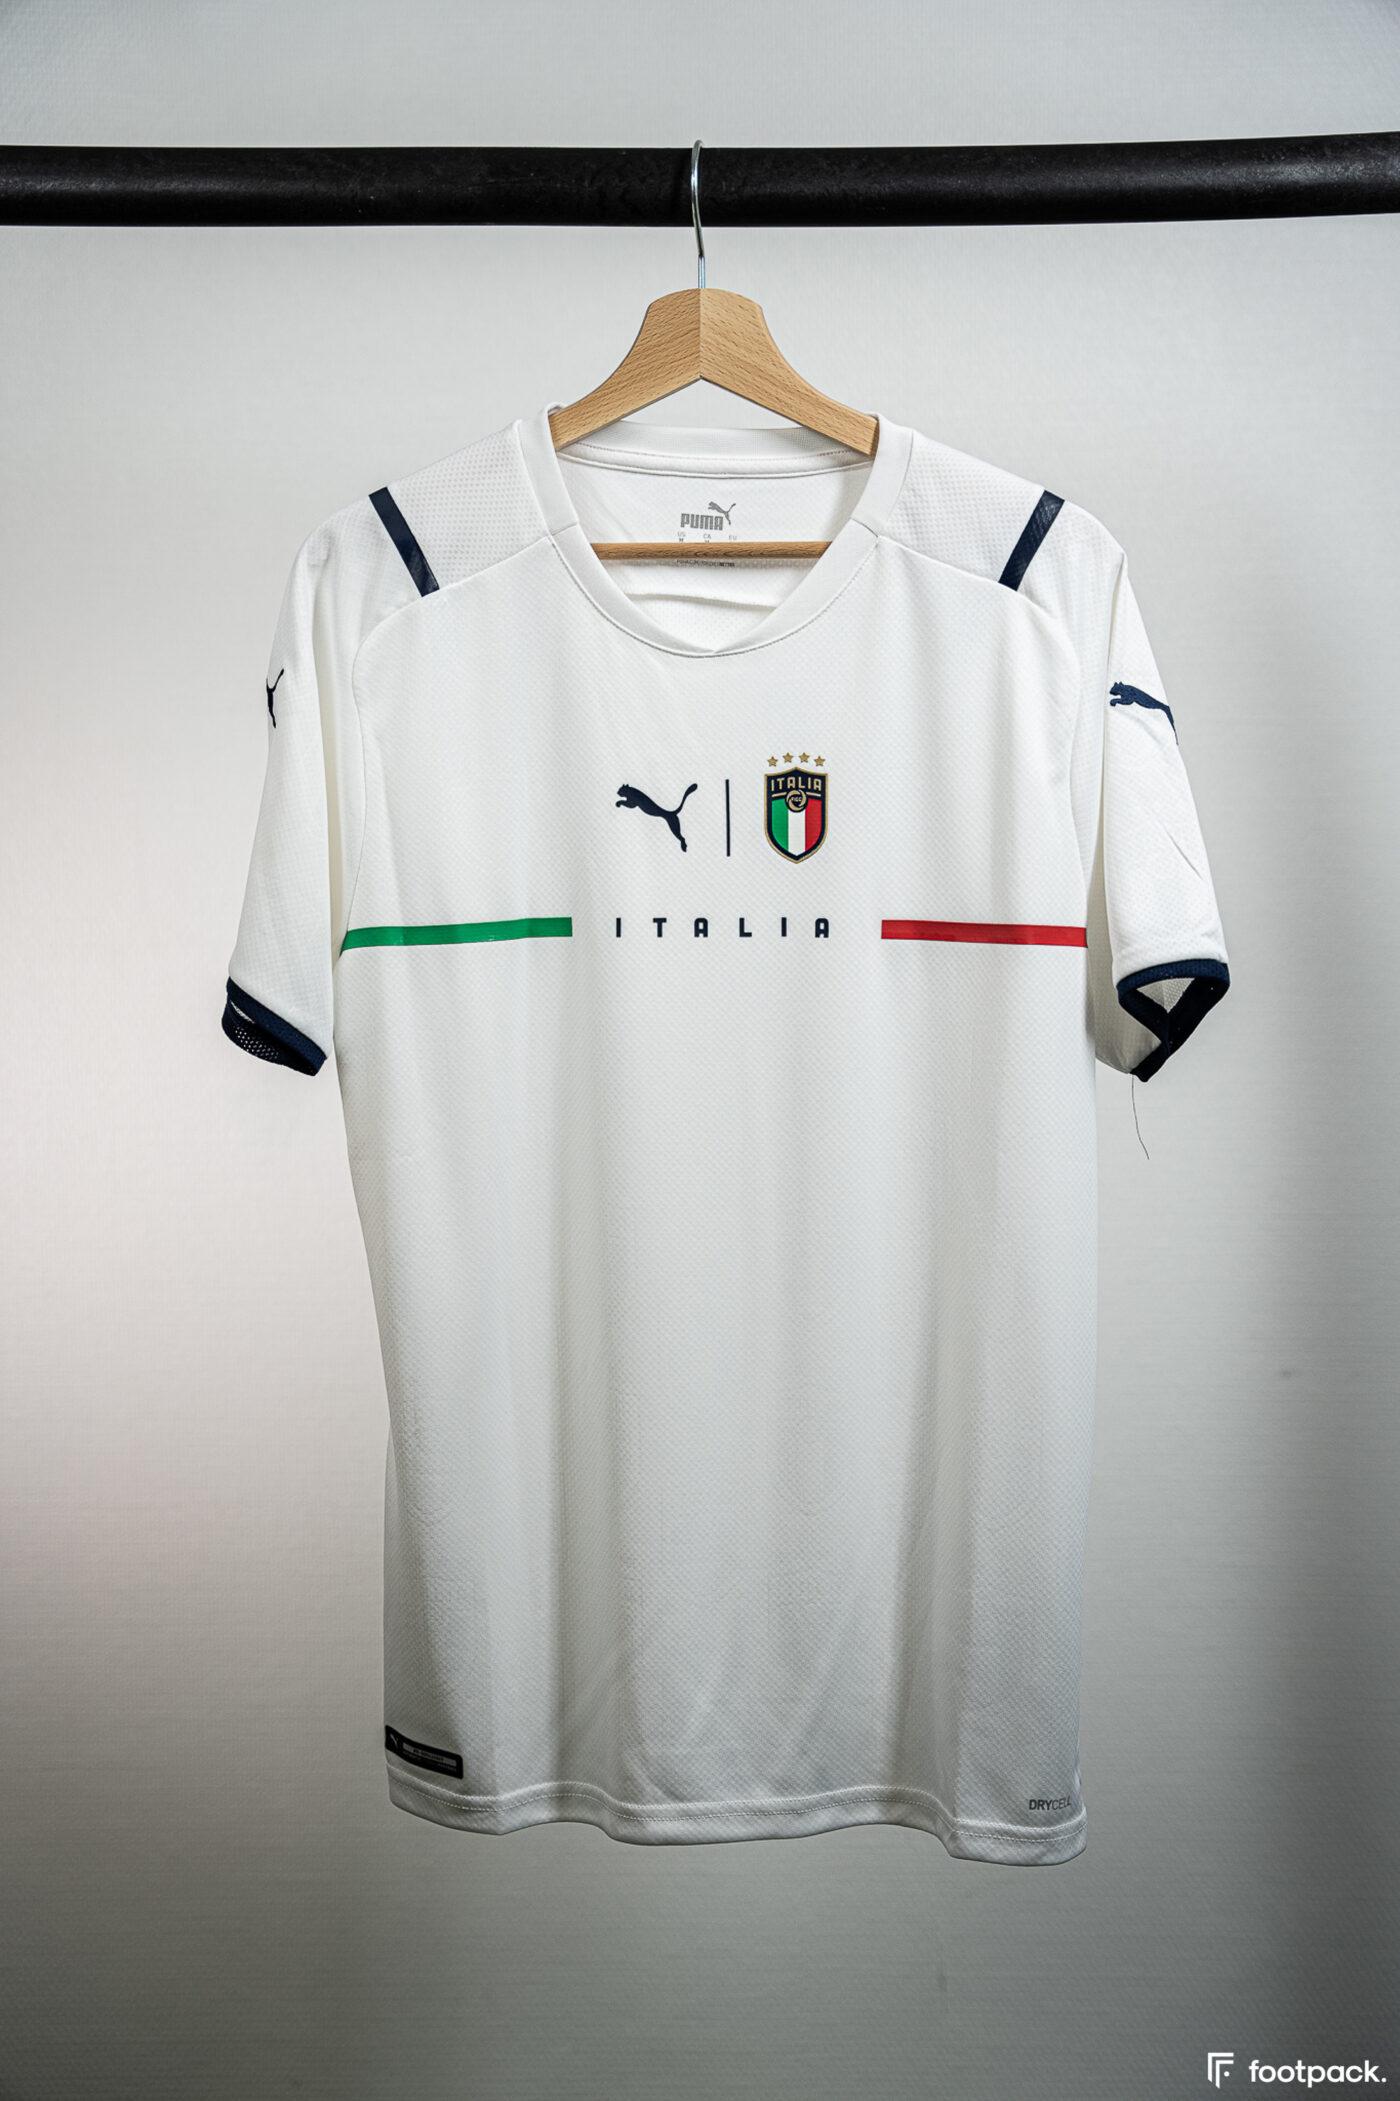 Maillot Italie Euro 2020 extérieur PUMA